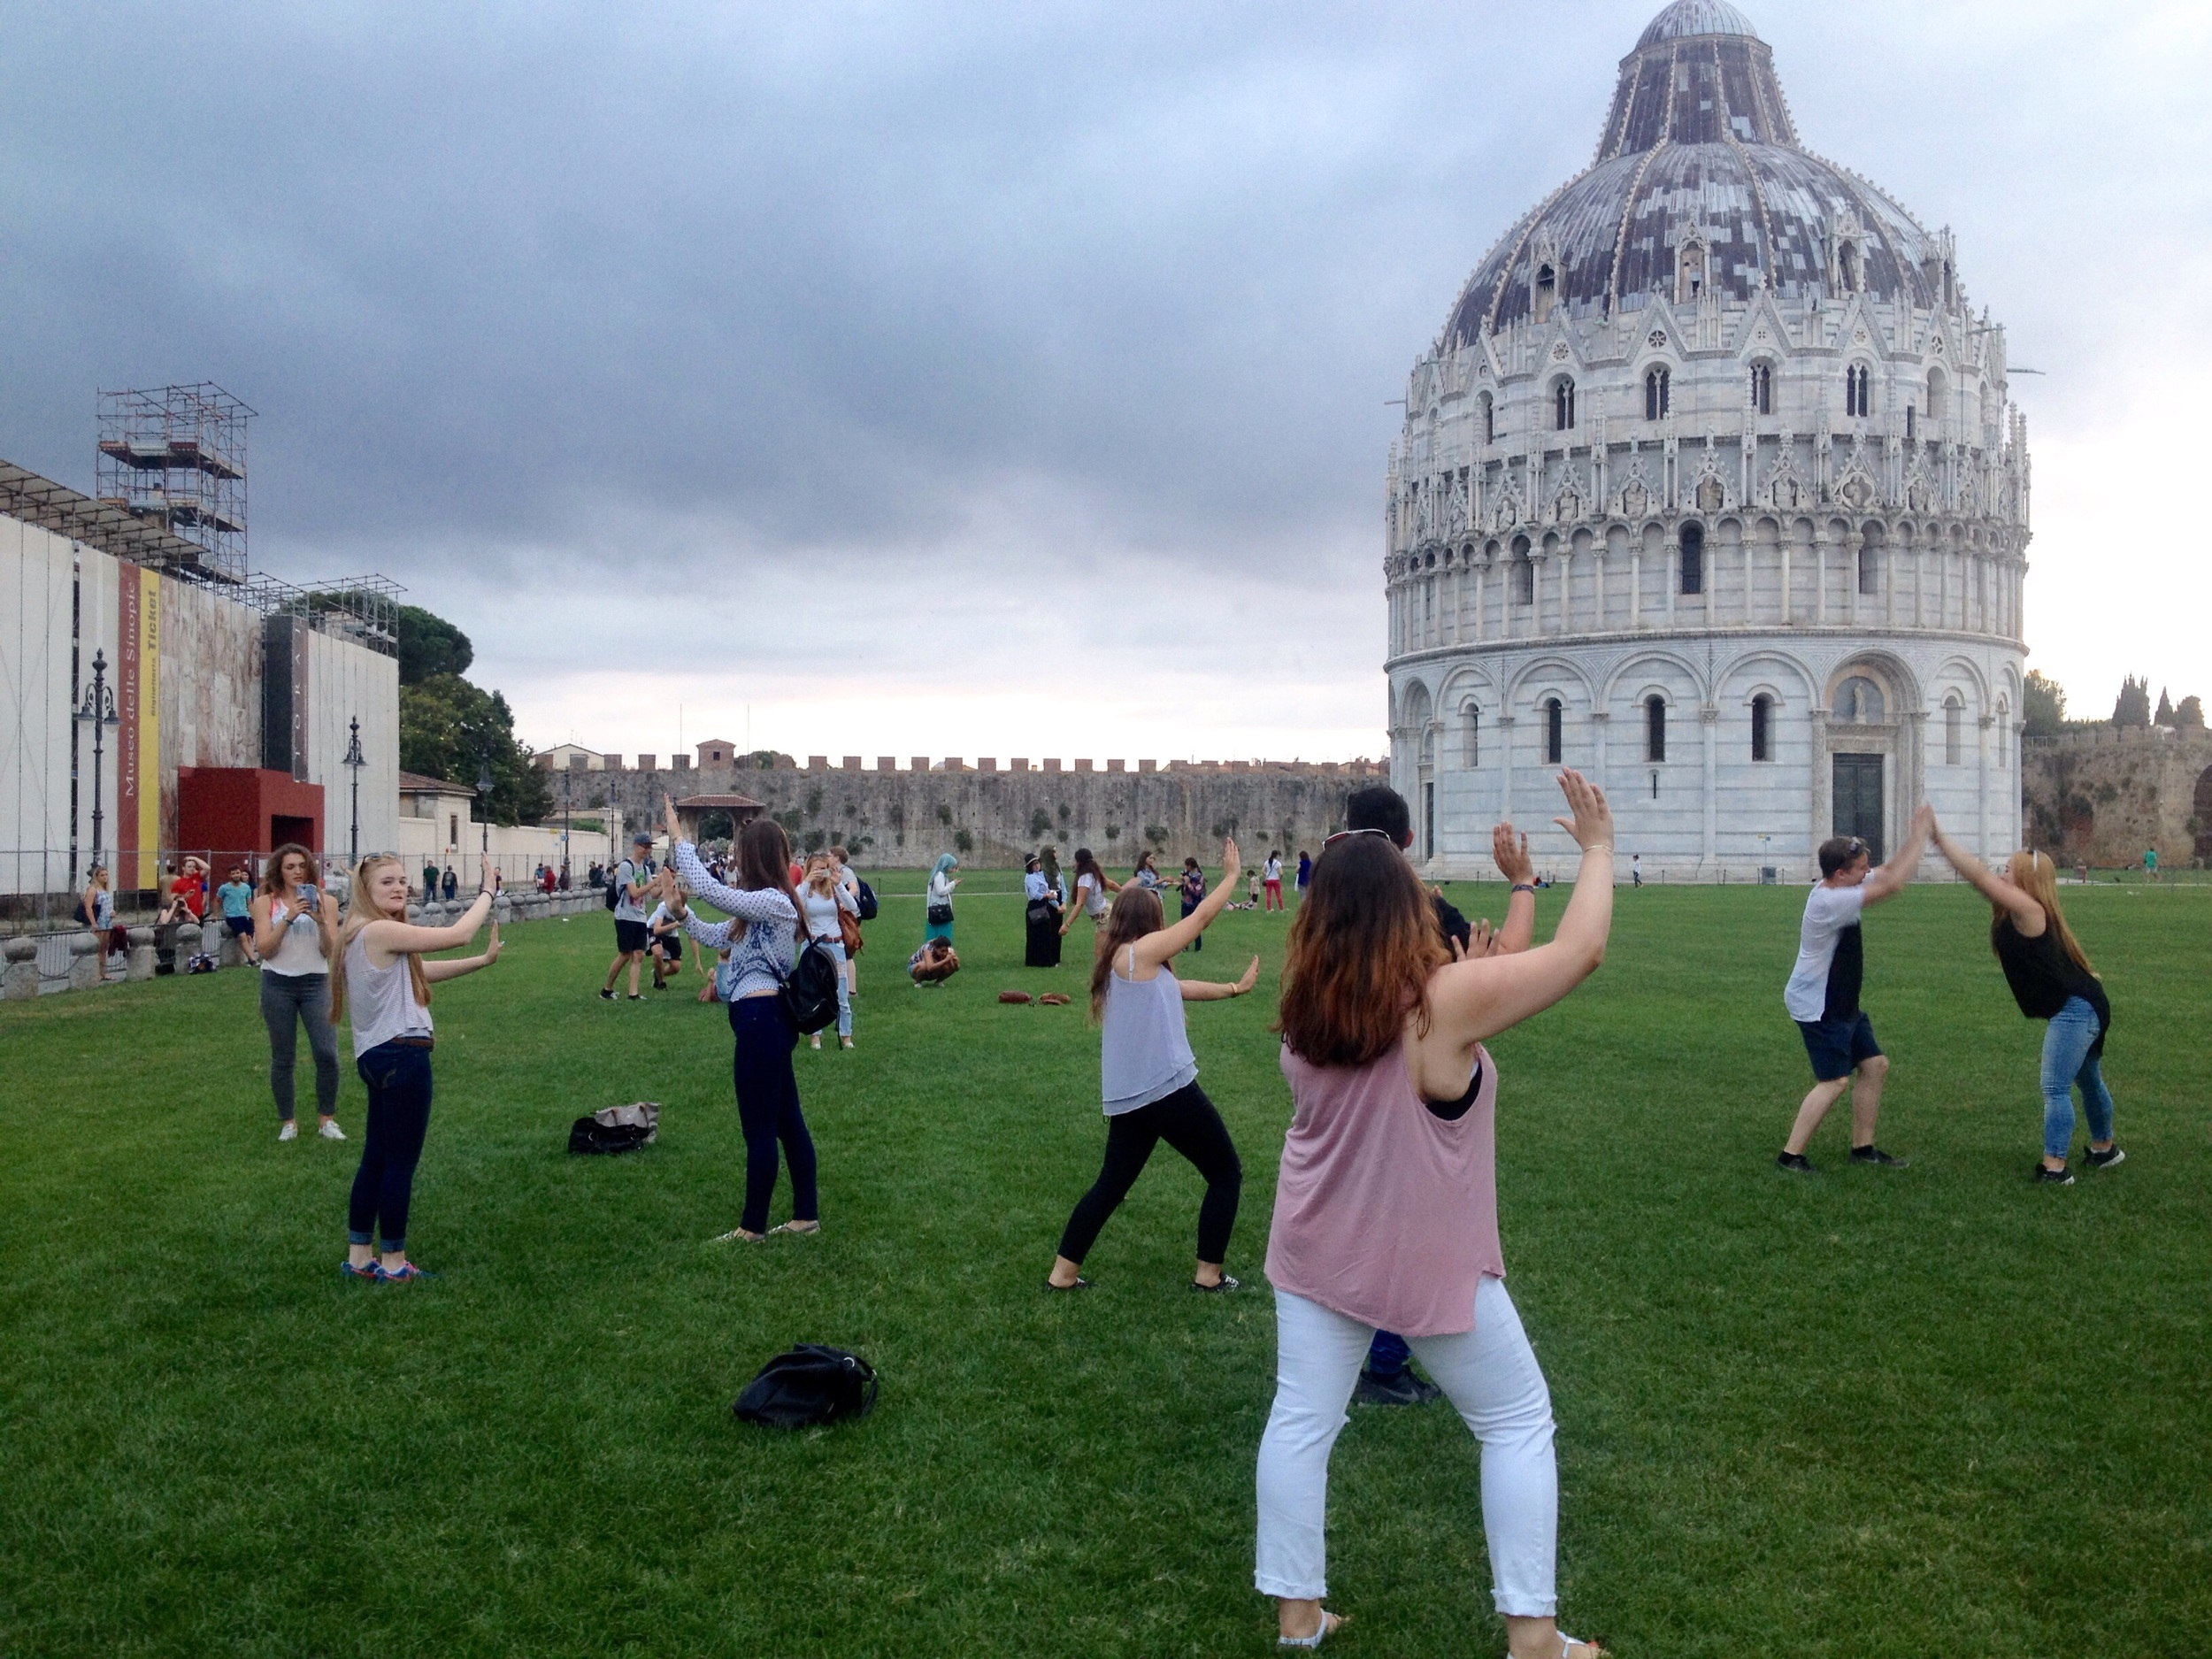 Throwing shapes at Pisa